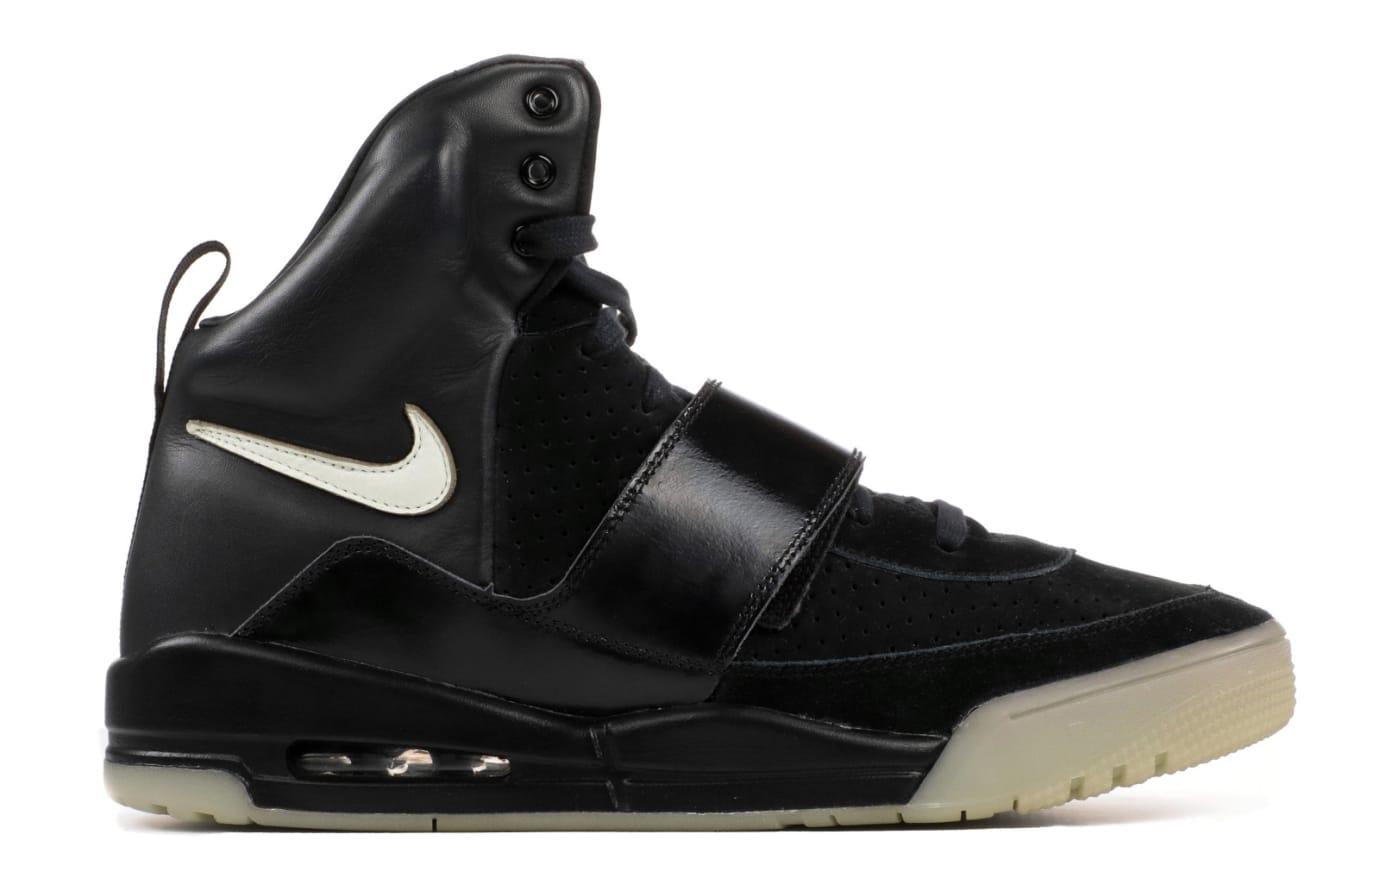 sale retailer 3e97e 41fd3 Nike Air Yeezy Glow Sample Profile